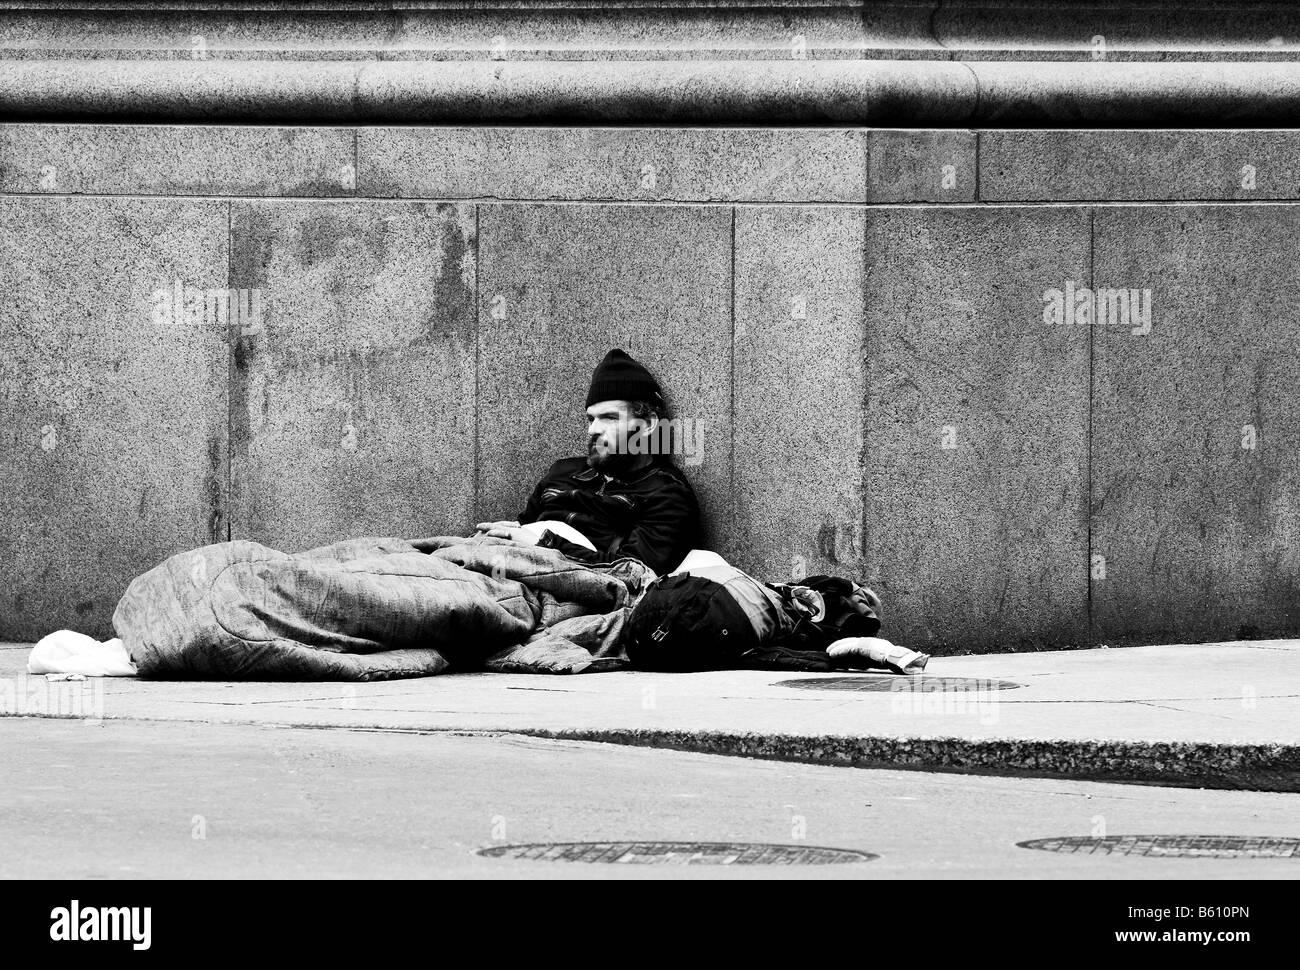 A black and white photo of a homeless man a bum a beggar sitting